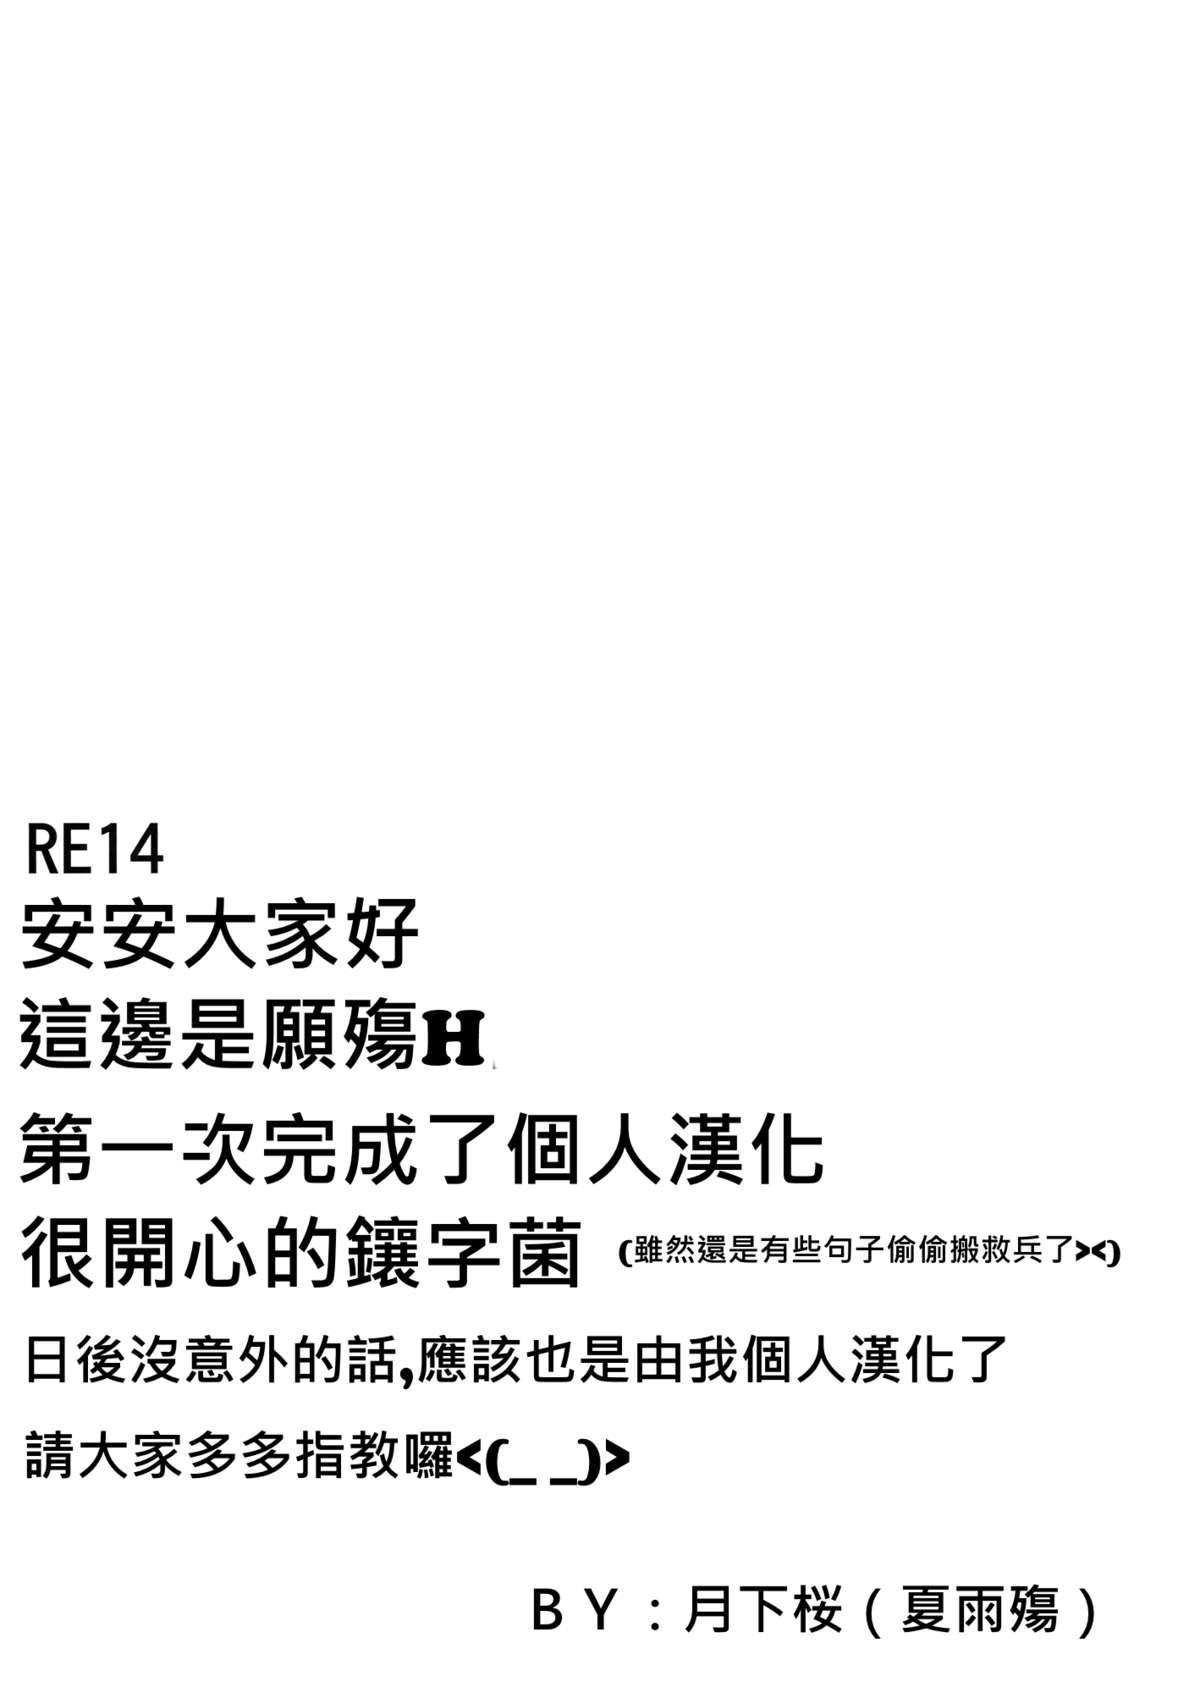 RE 14 29